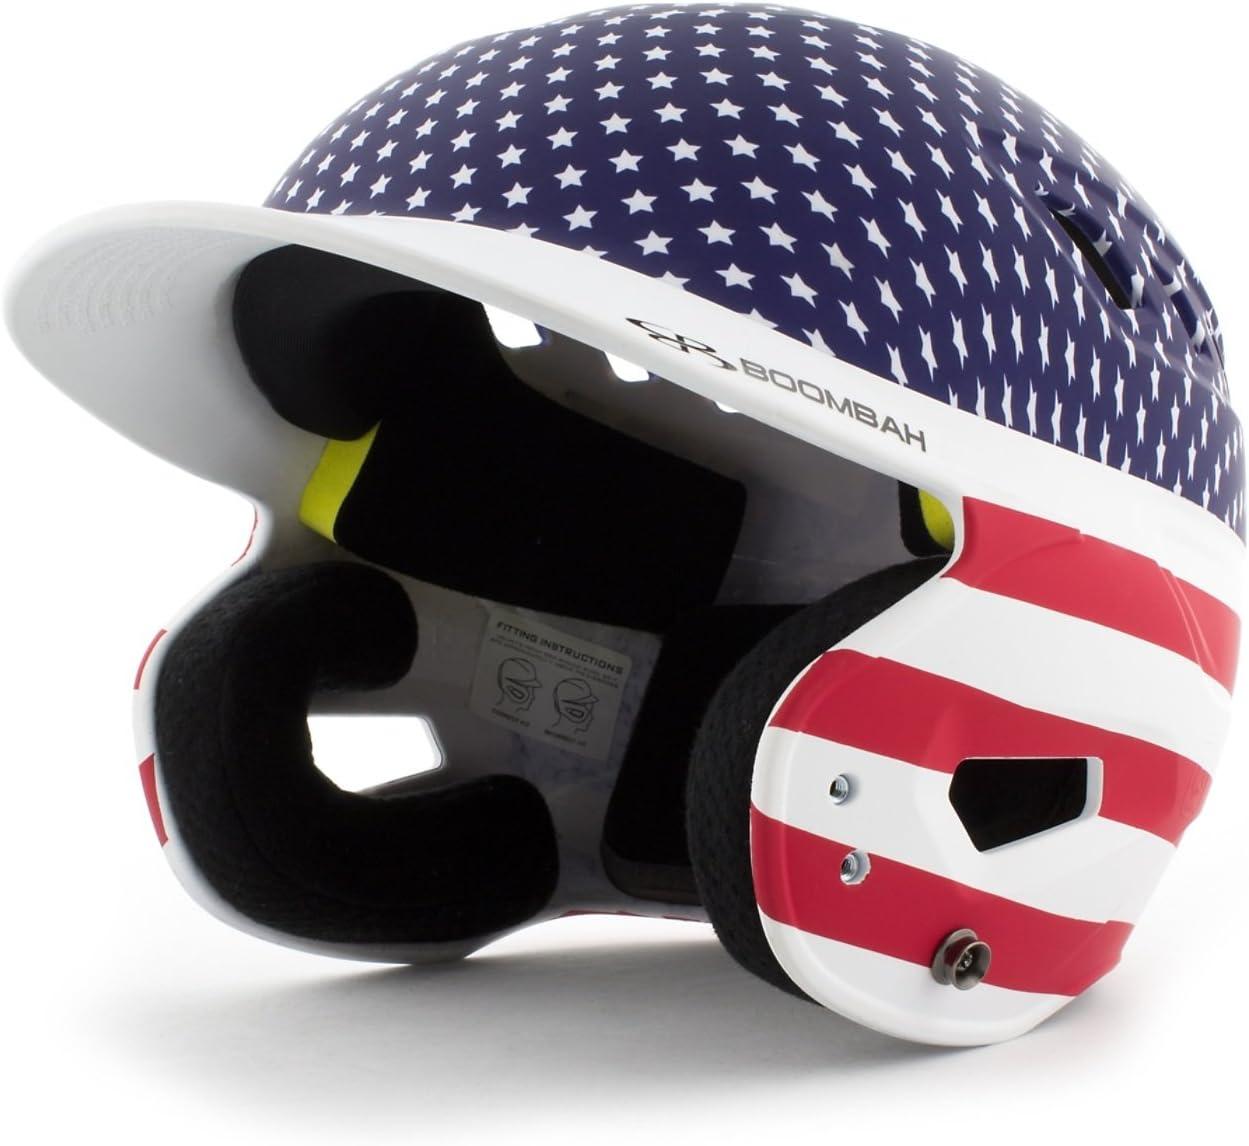 Boombah DEFCON Softball Baseball Helmet Stars and 2 Oklahoma City Mall Stripes Si - Limited price